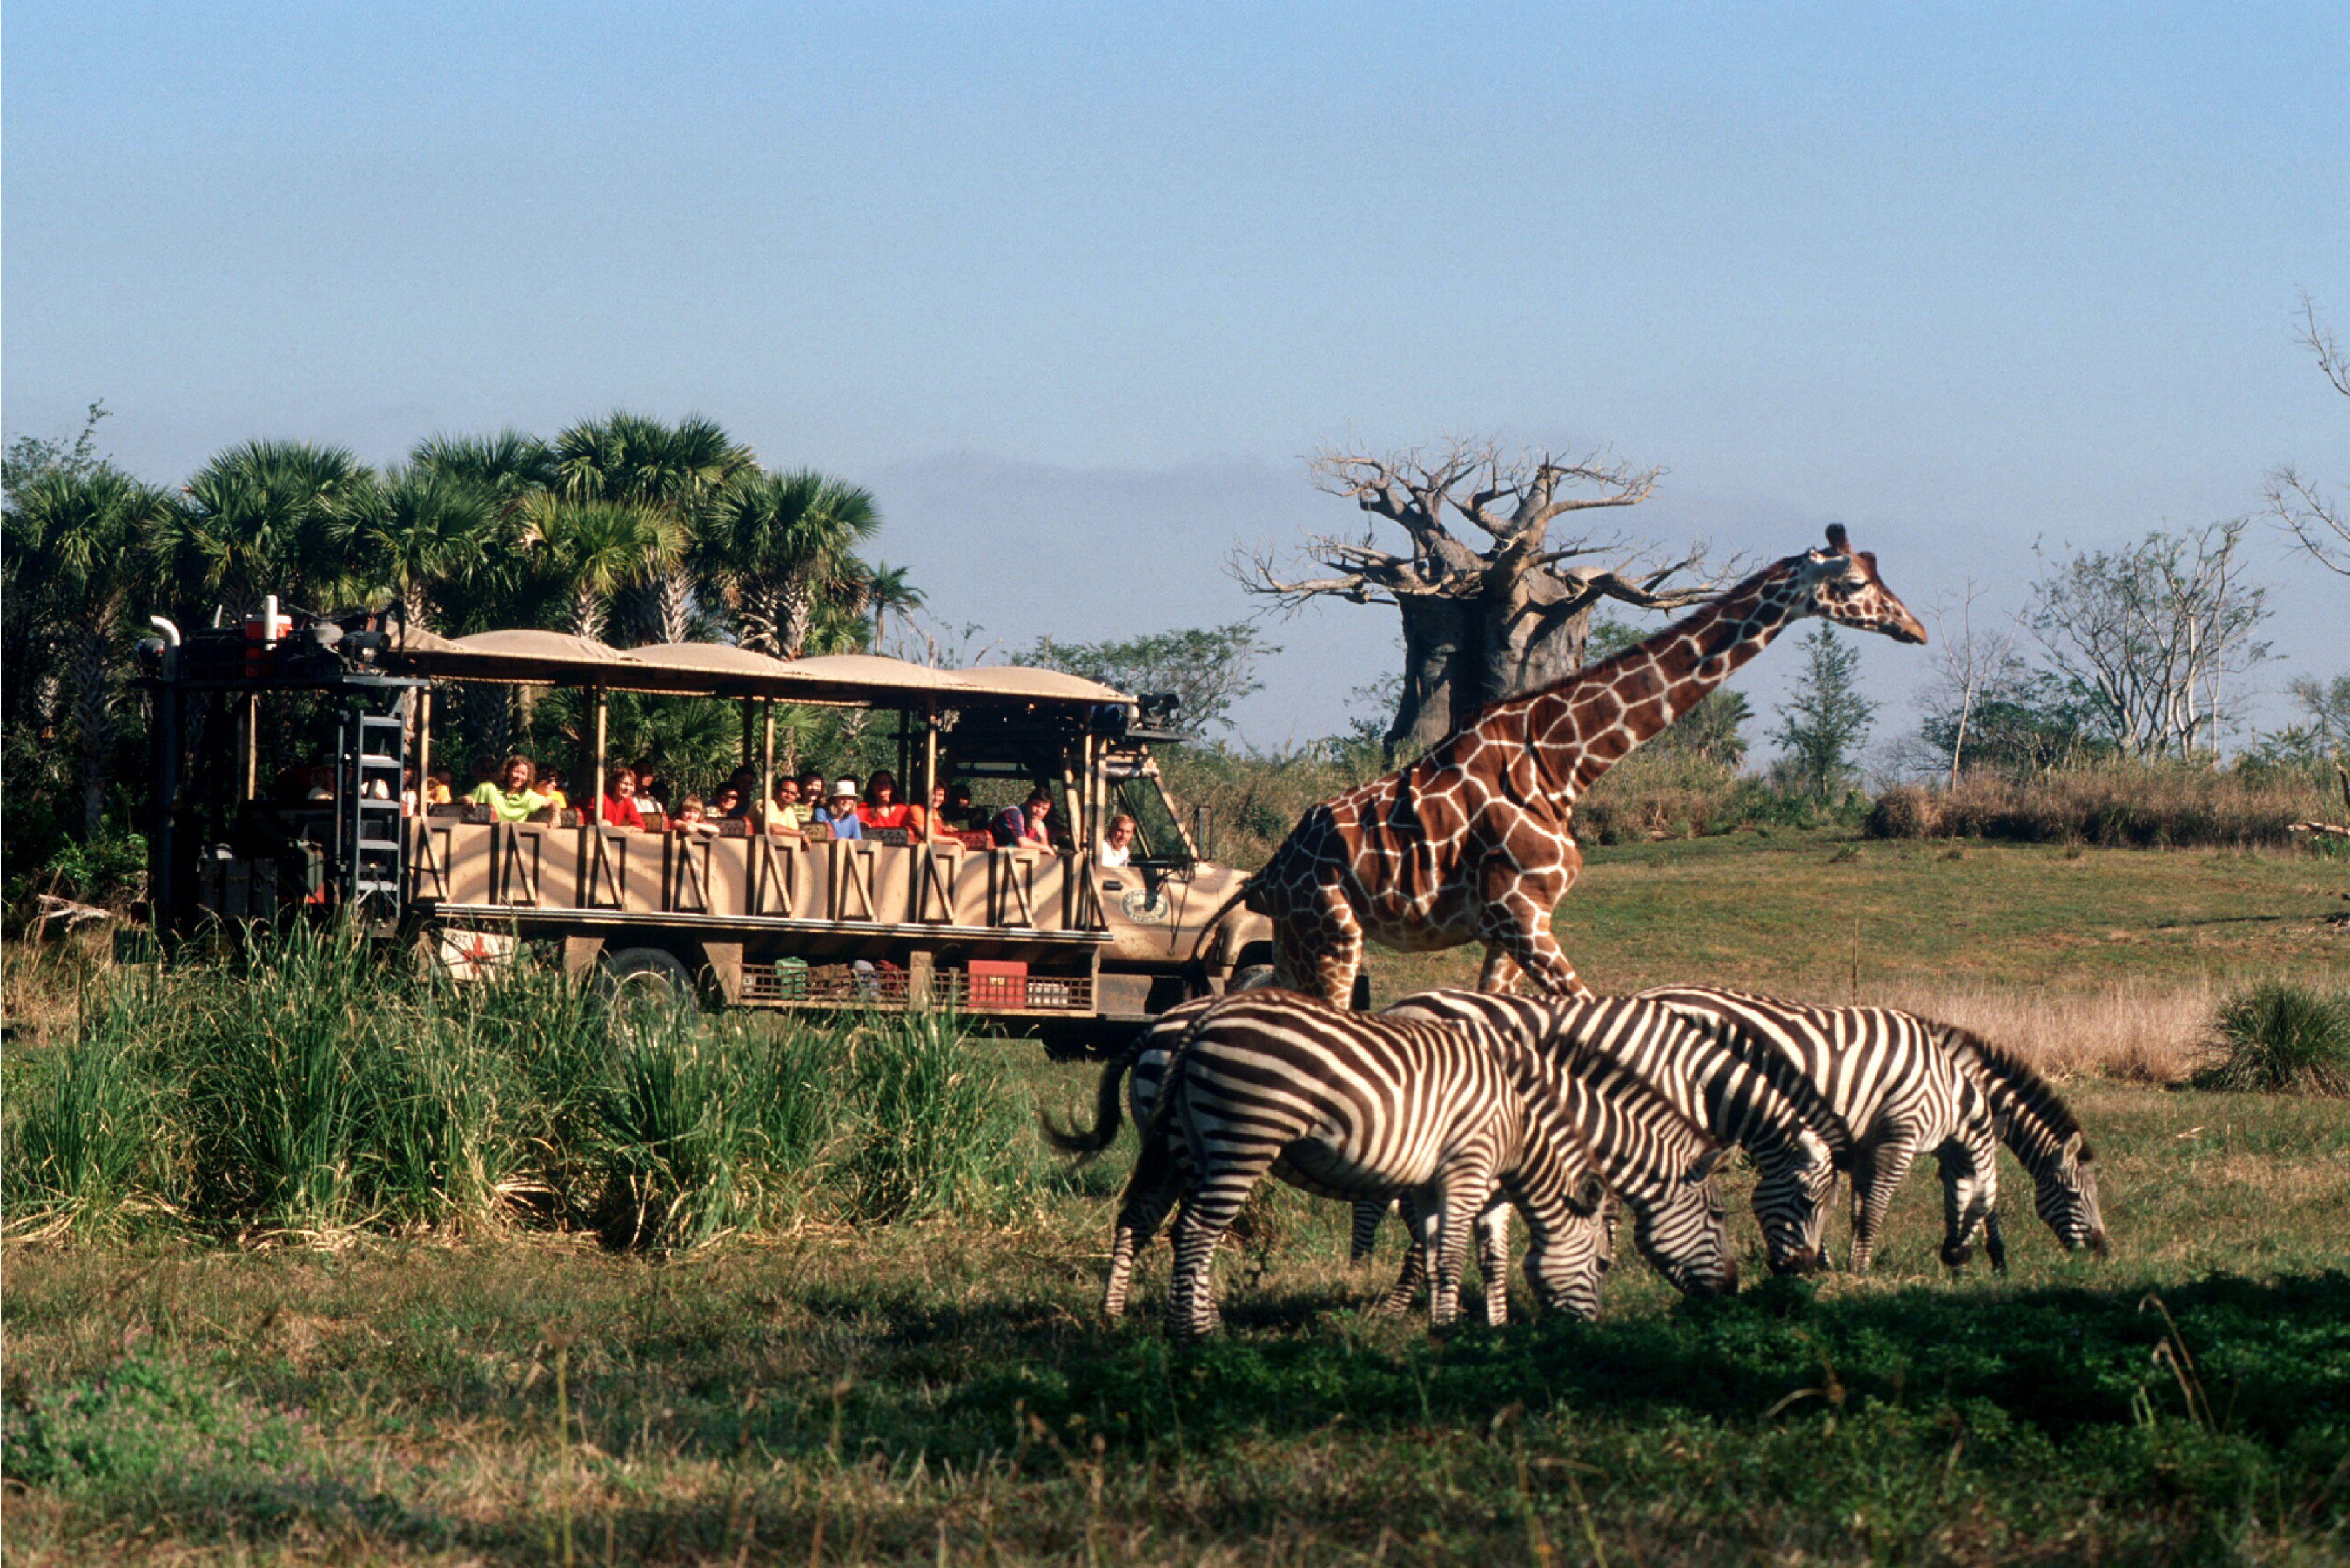 Kilamanjaro Safari vehicle loaded with Disney World guests observing giraffe and zebras.